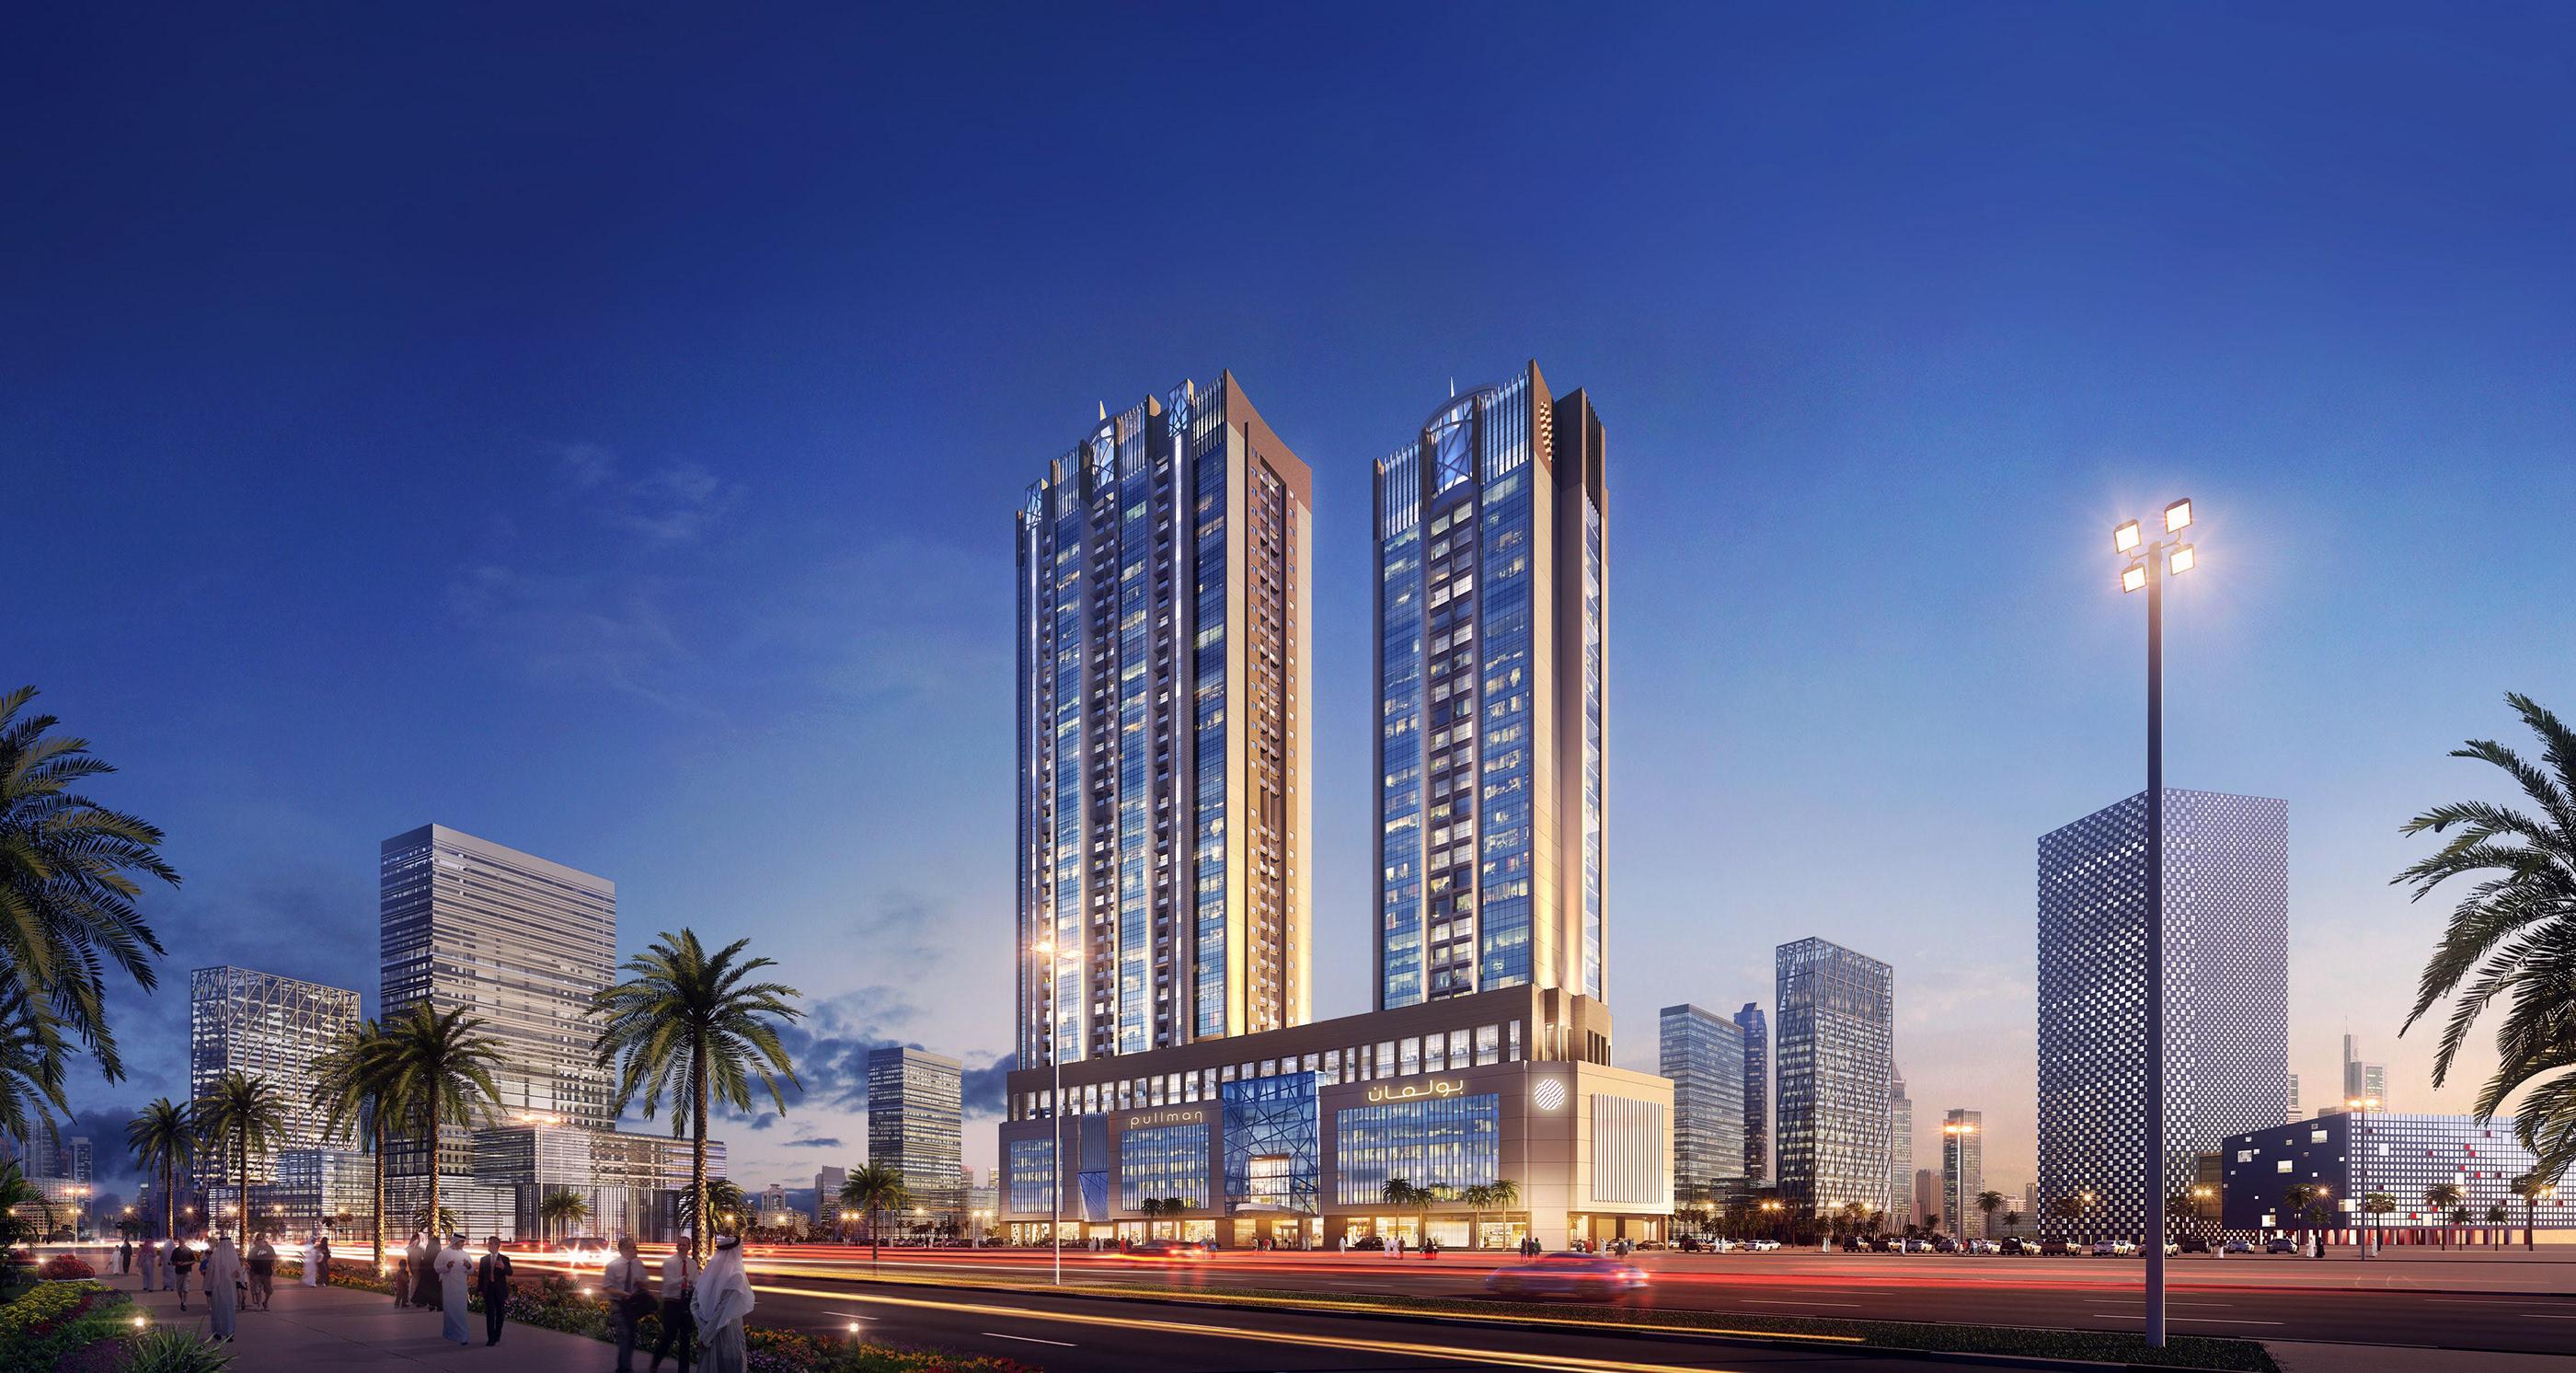 Pullman Hotel & Apartments, Sharjah on Behance